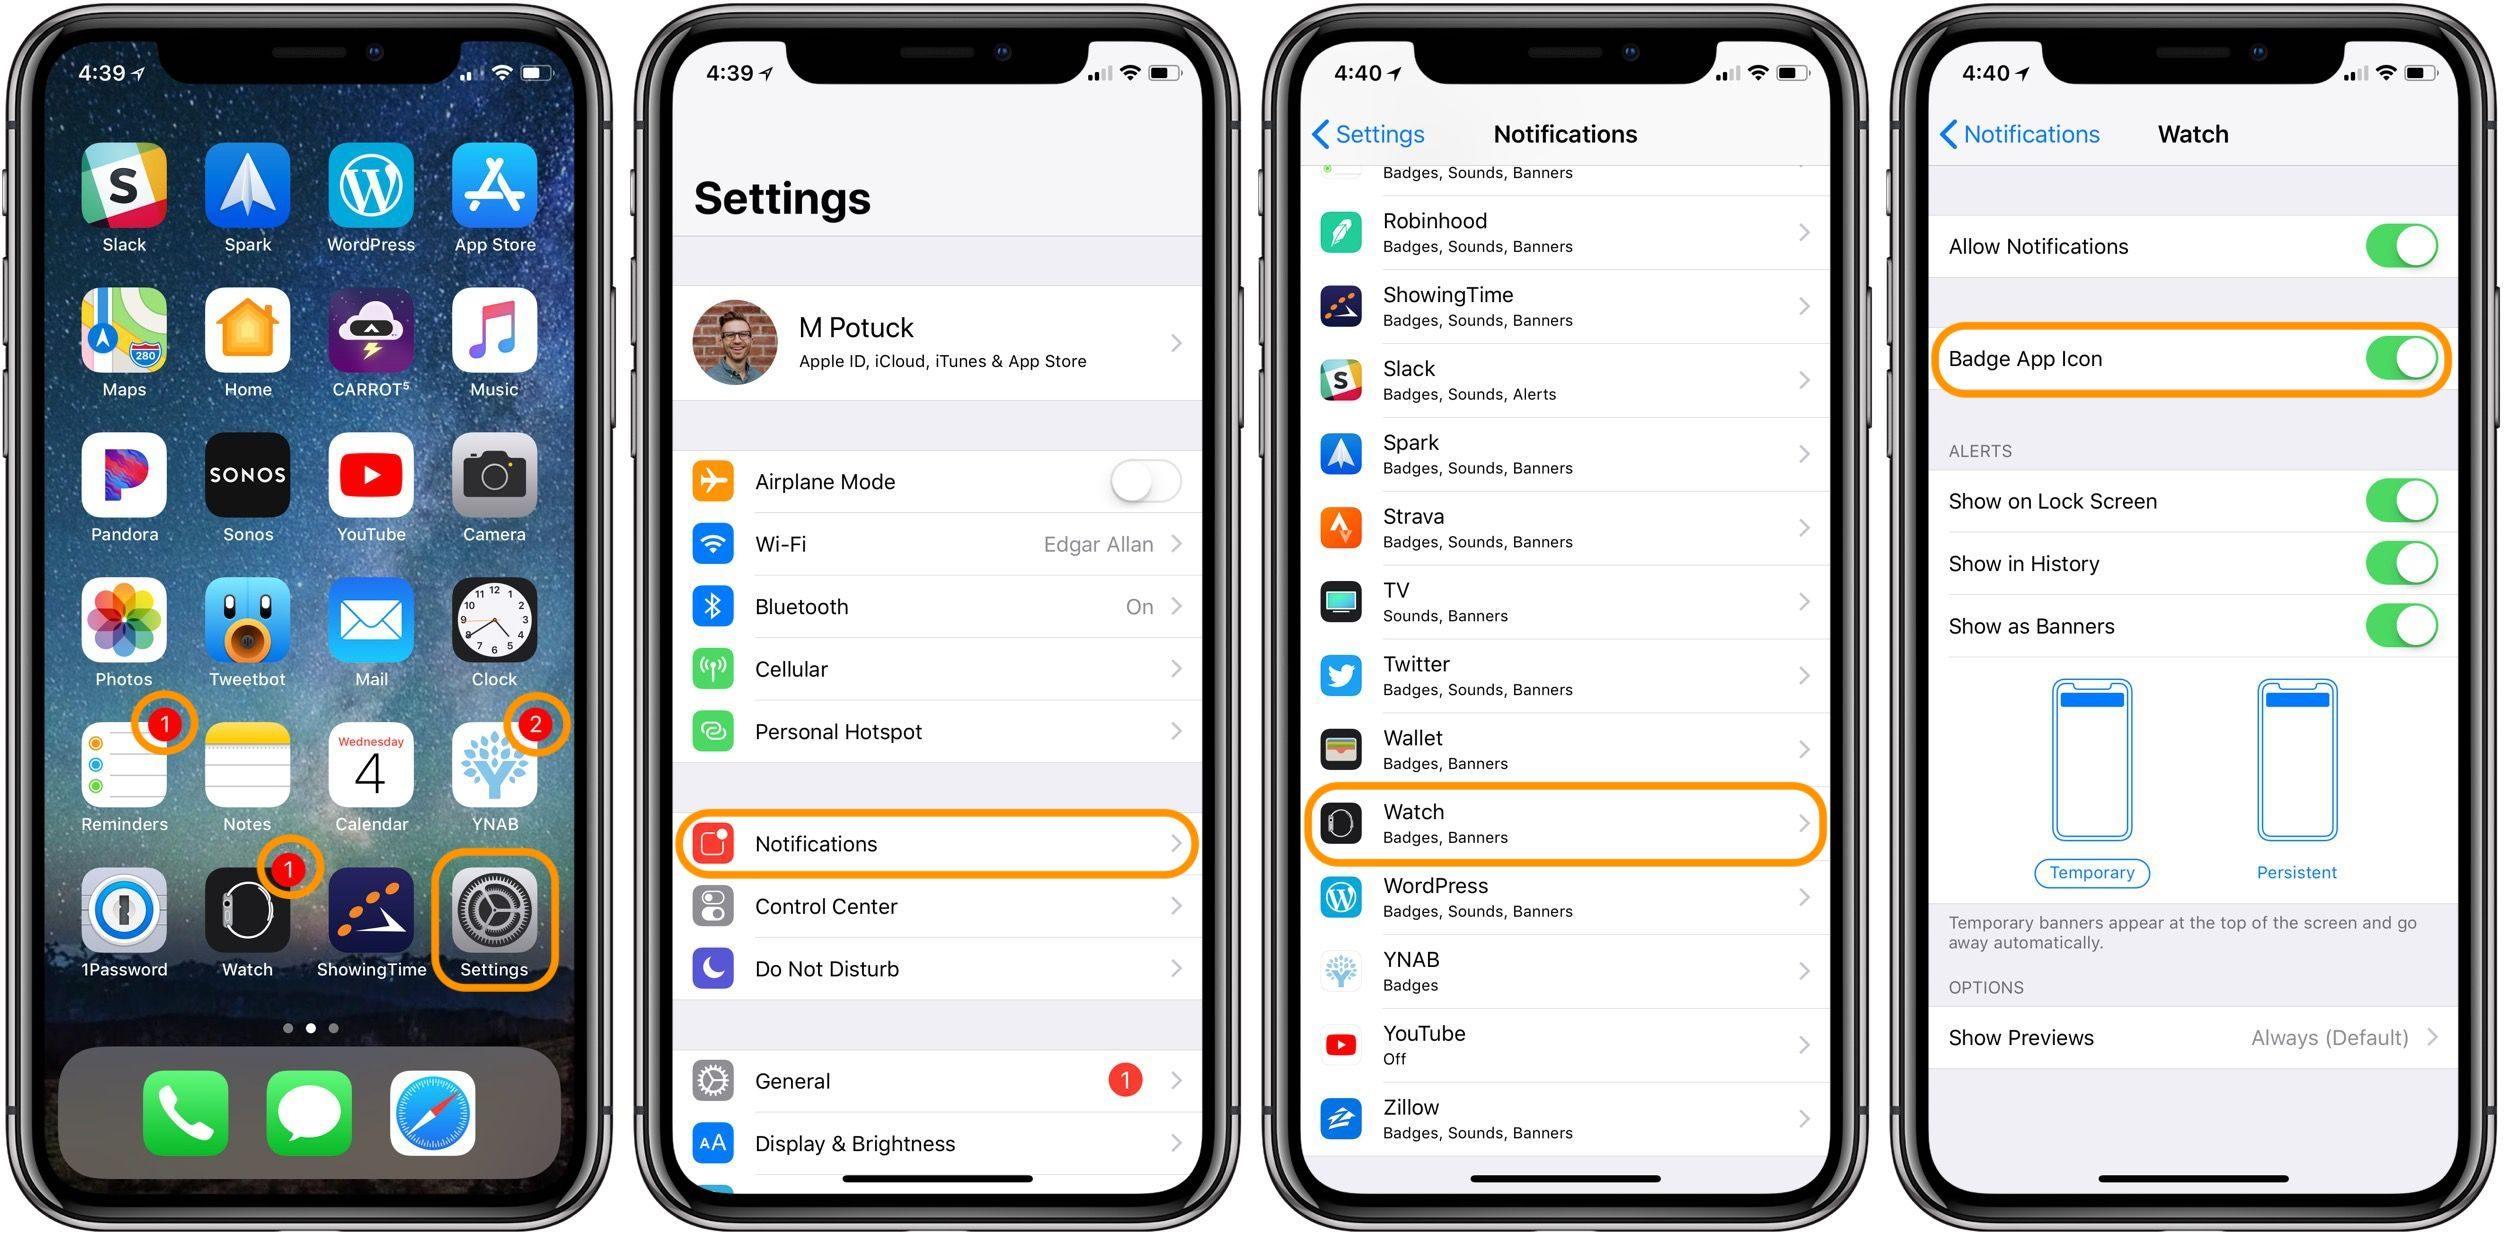 "<span href=""https://9to5mac.com/2018/04/04/how-to-turn-off-app-notification-badges-iphone/"">Cómo desactivar la aplicación de notificación notificaciones en iPhone</a>"